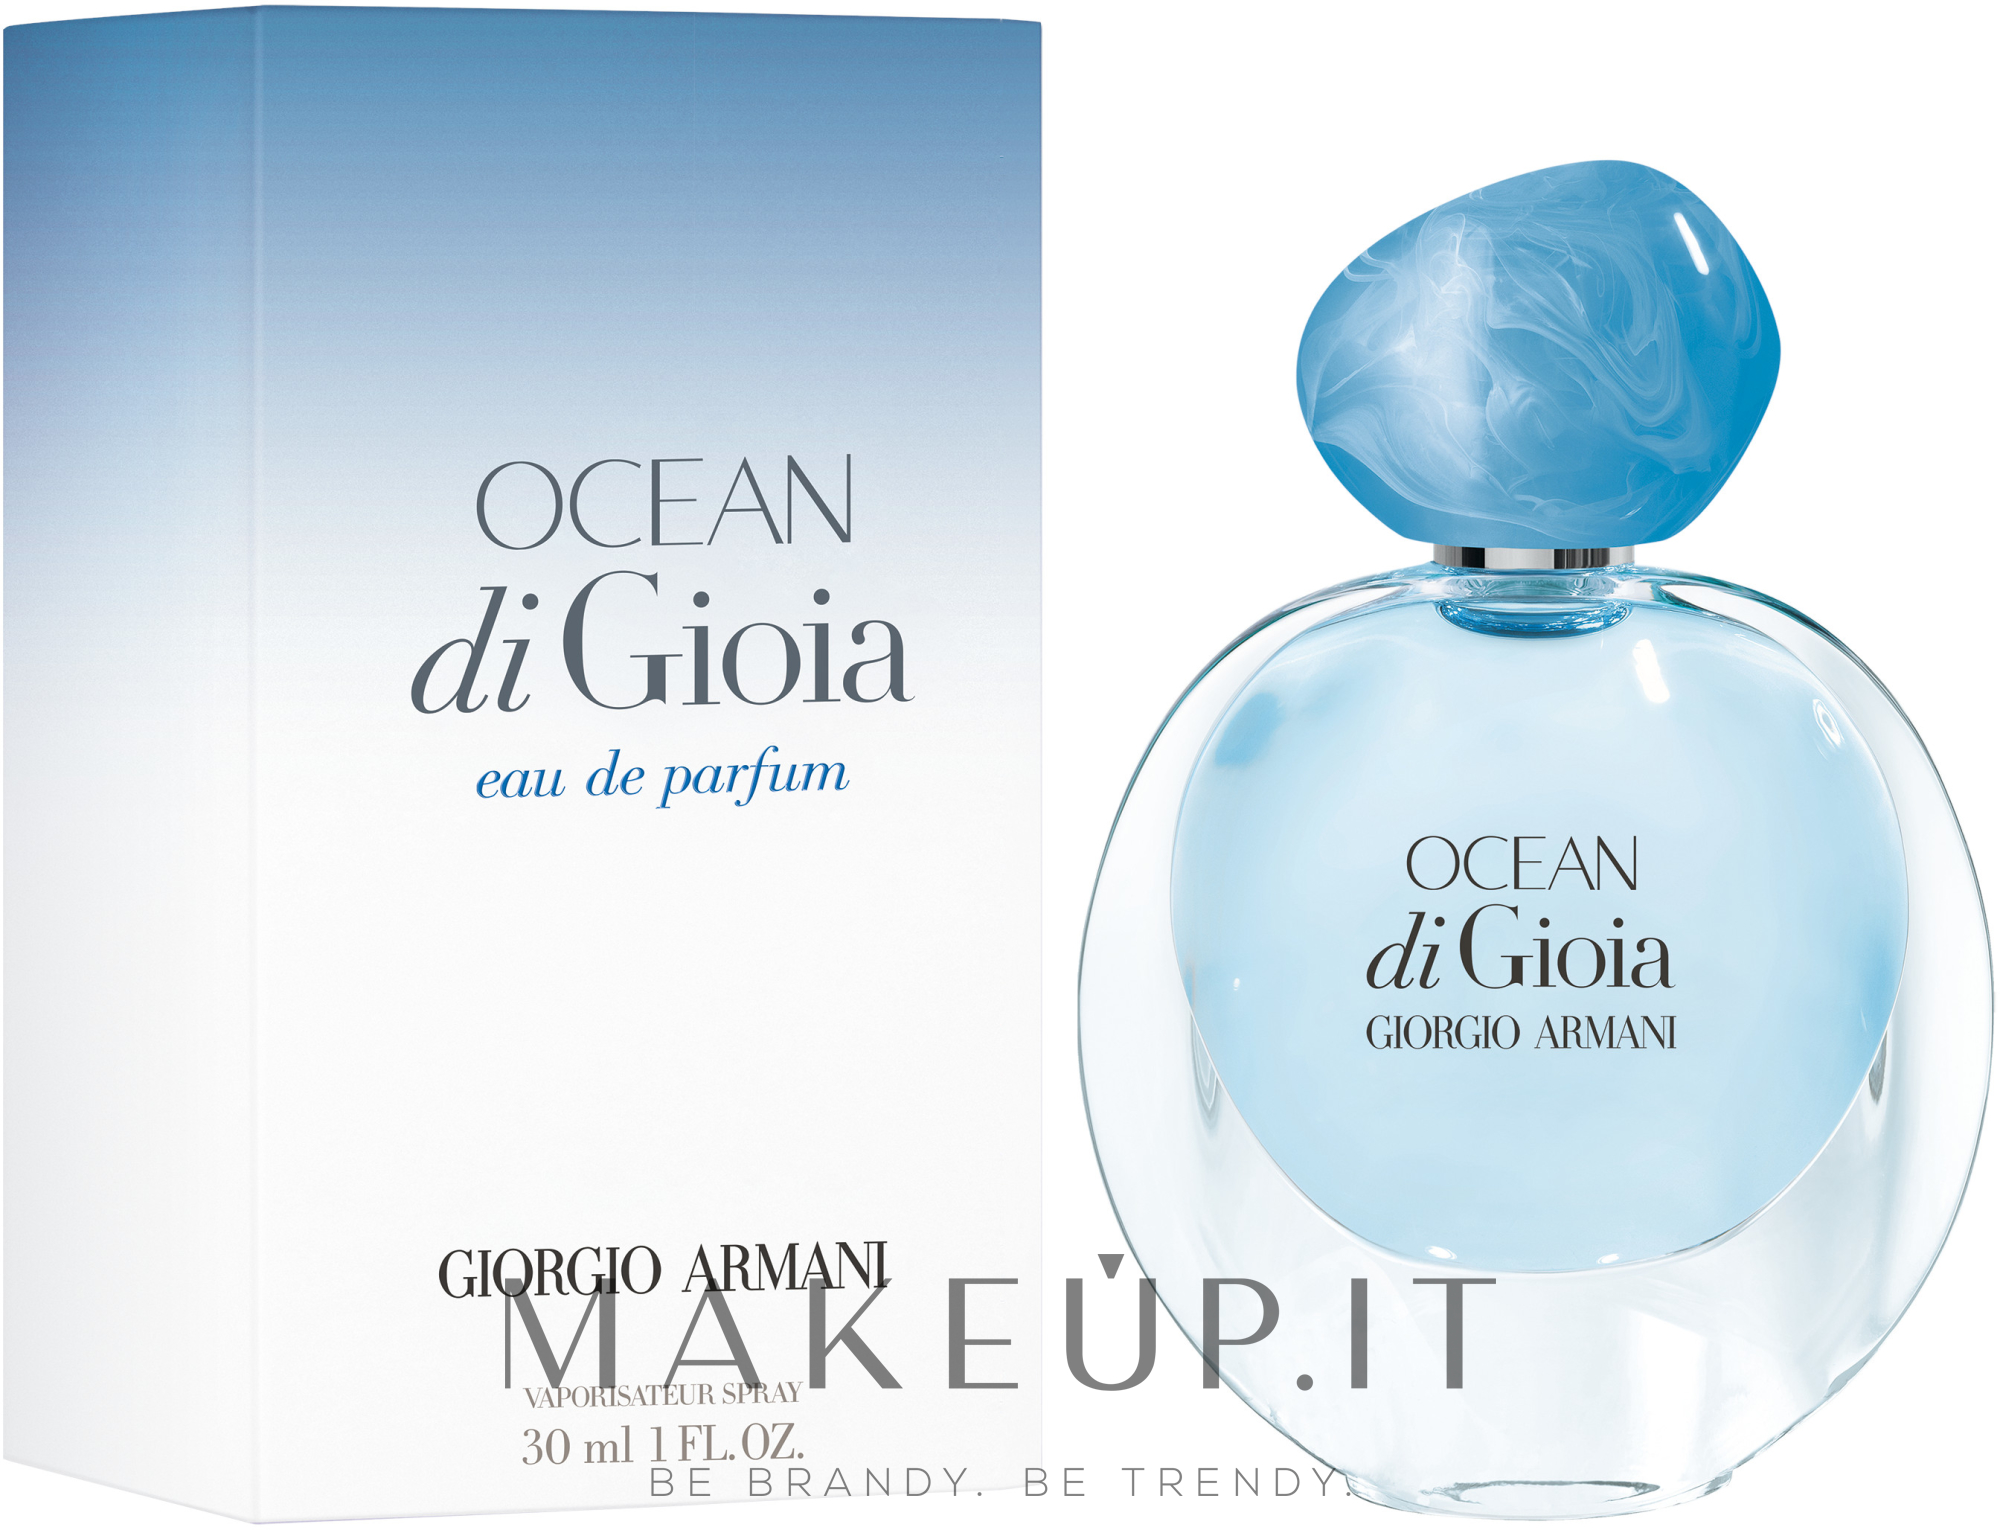 Giorgio Armani Ocean di Gioia - Eau de parfum — foto 30 ml